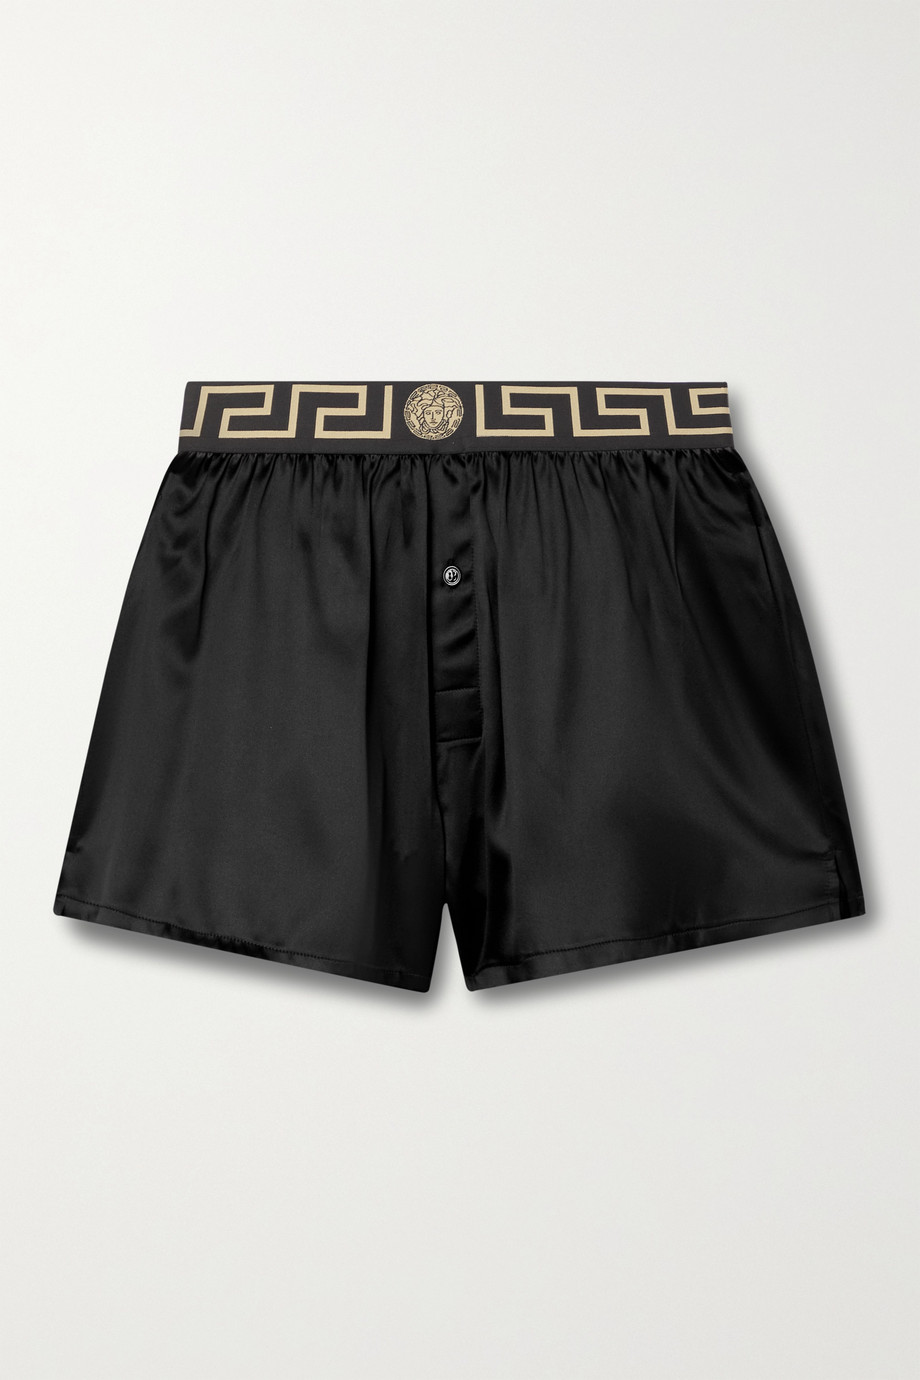 Versace Shorts aus Stretch-Seidensatin mit Jacquard-Besatz